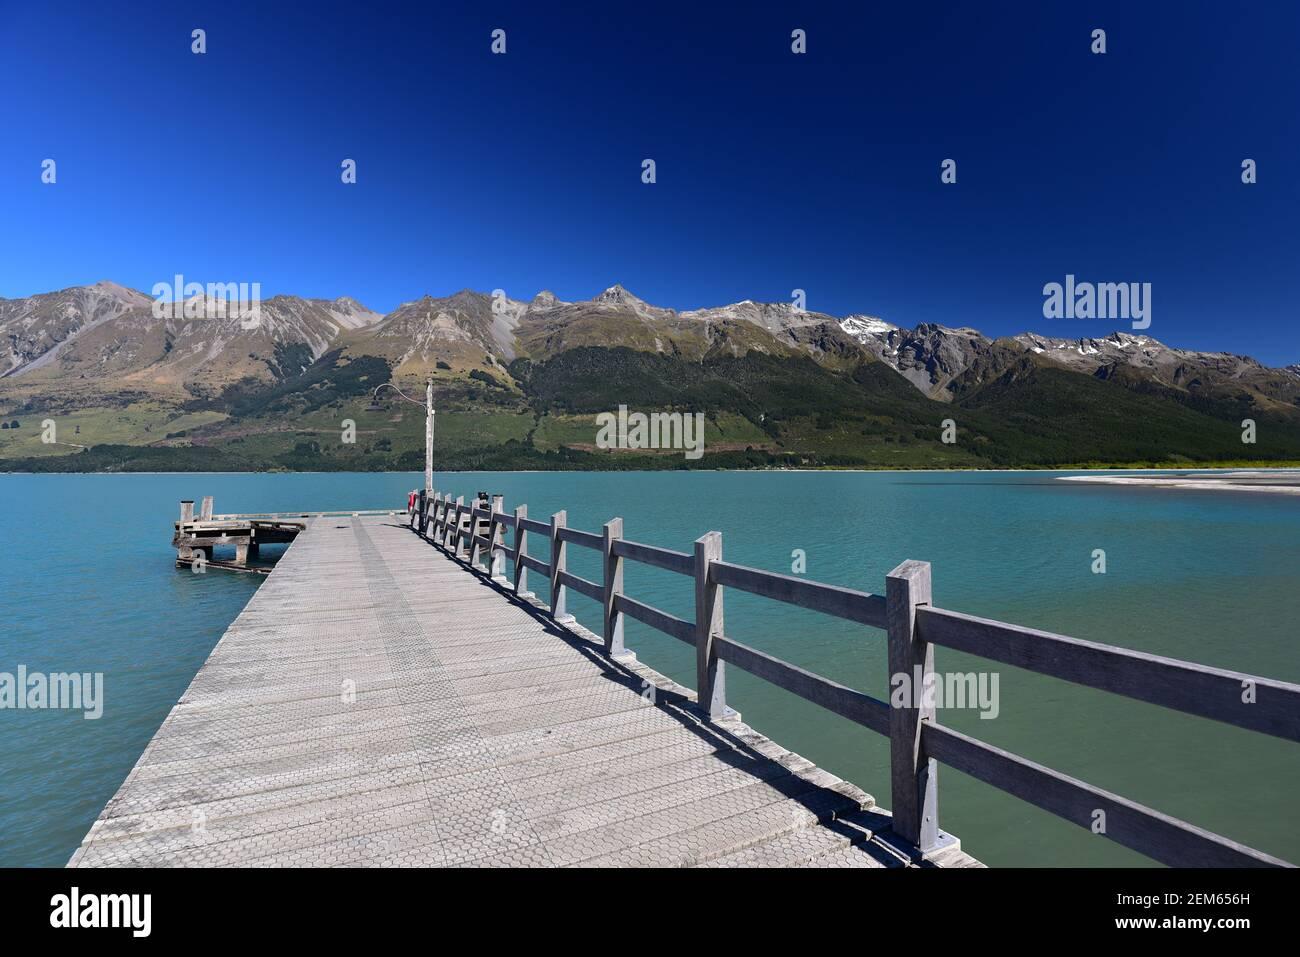 Embarcadero del Lago Wakatipu en Glenorchy cerca de Queenstown, Nueva Zelanda Foto de stock